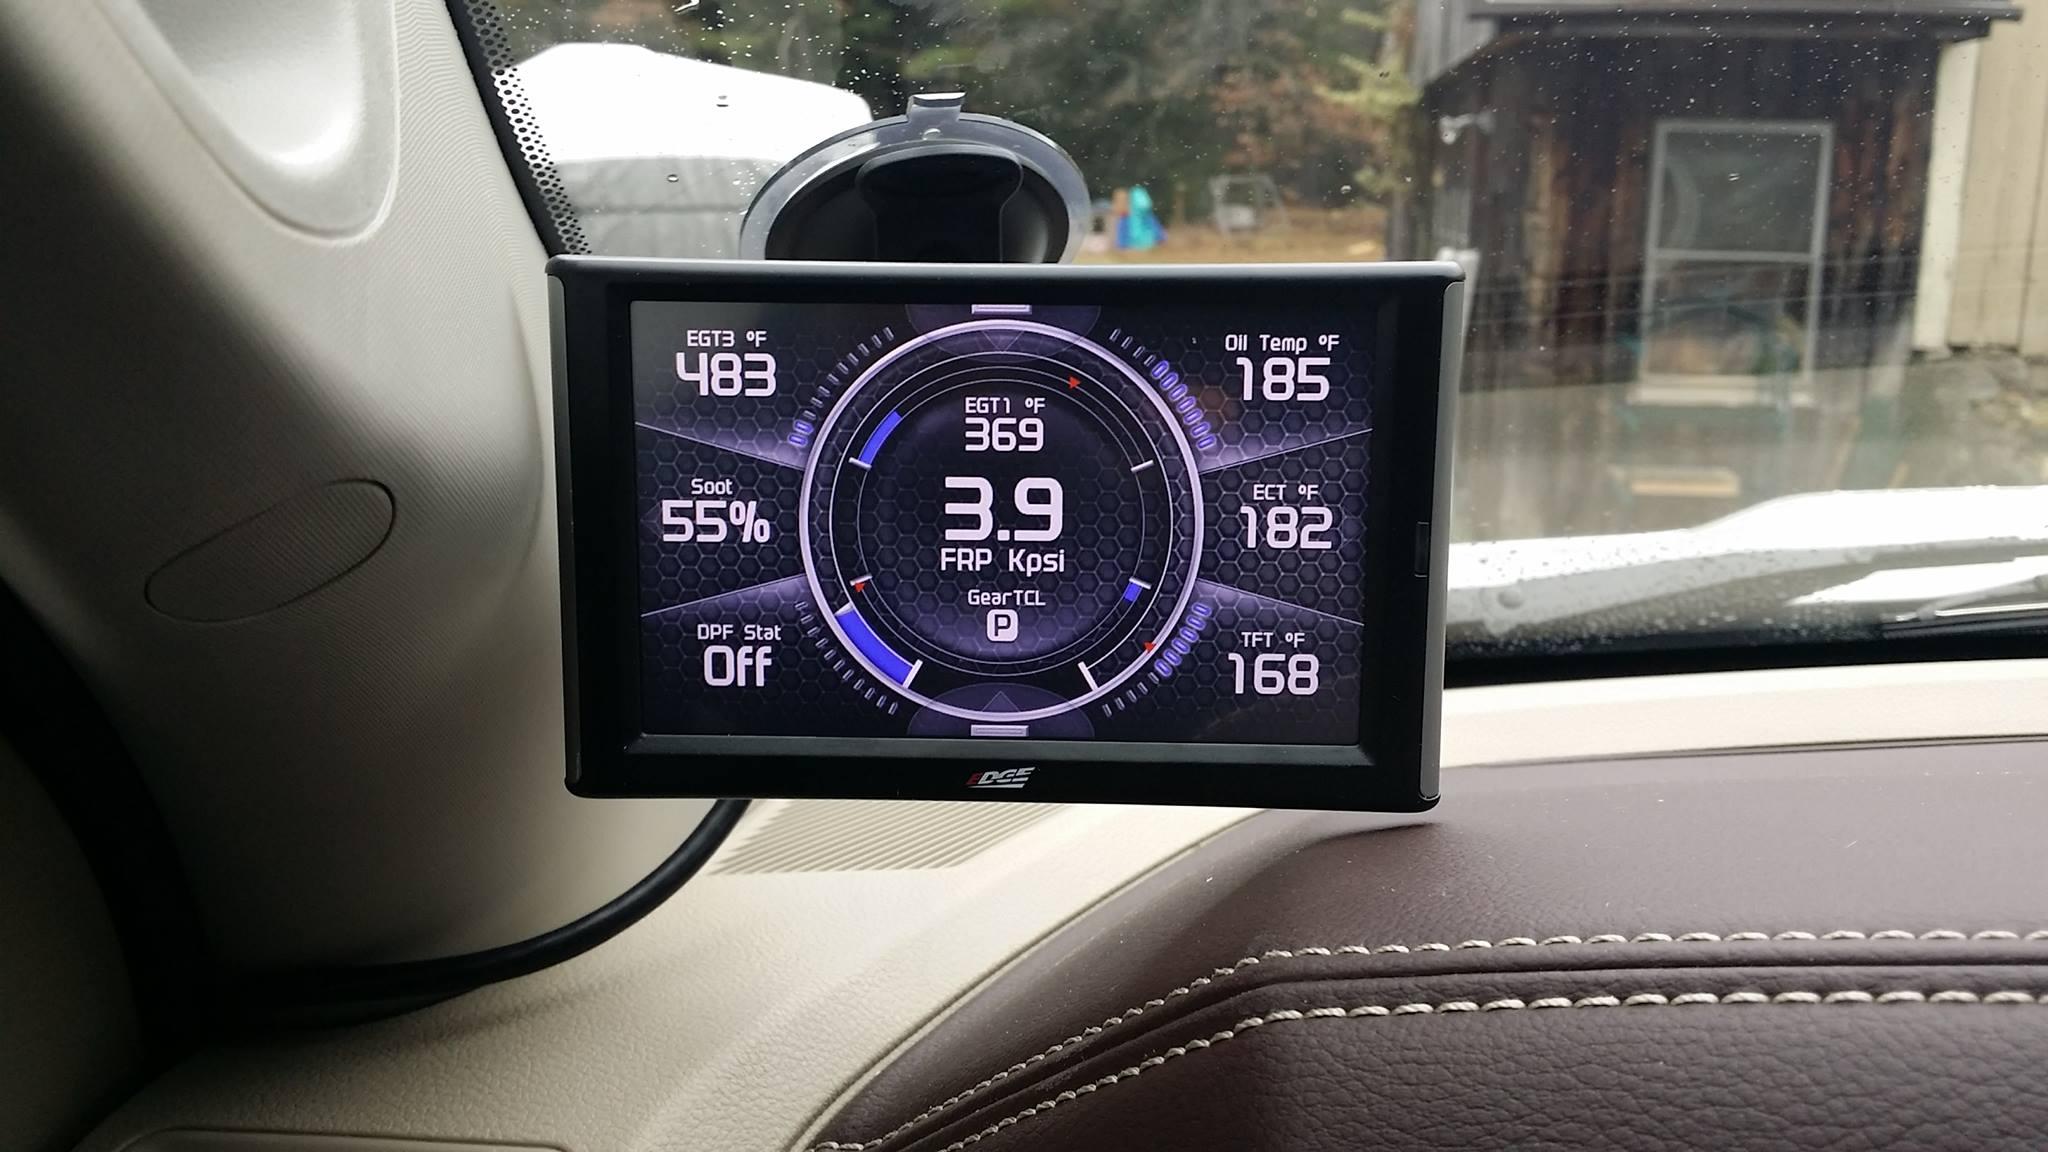 Tonneau Cover Dodge Ram 1500 >> Edge Insight CS/CTS, CS2, CTS2 Update - Page 7